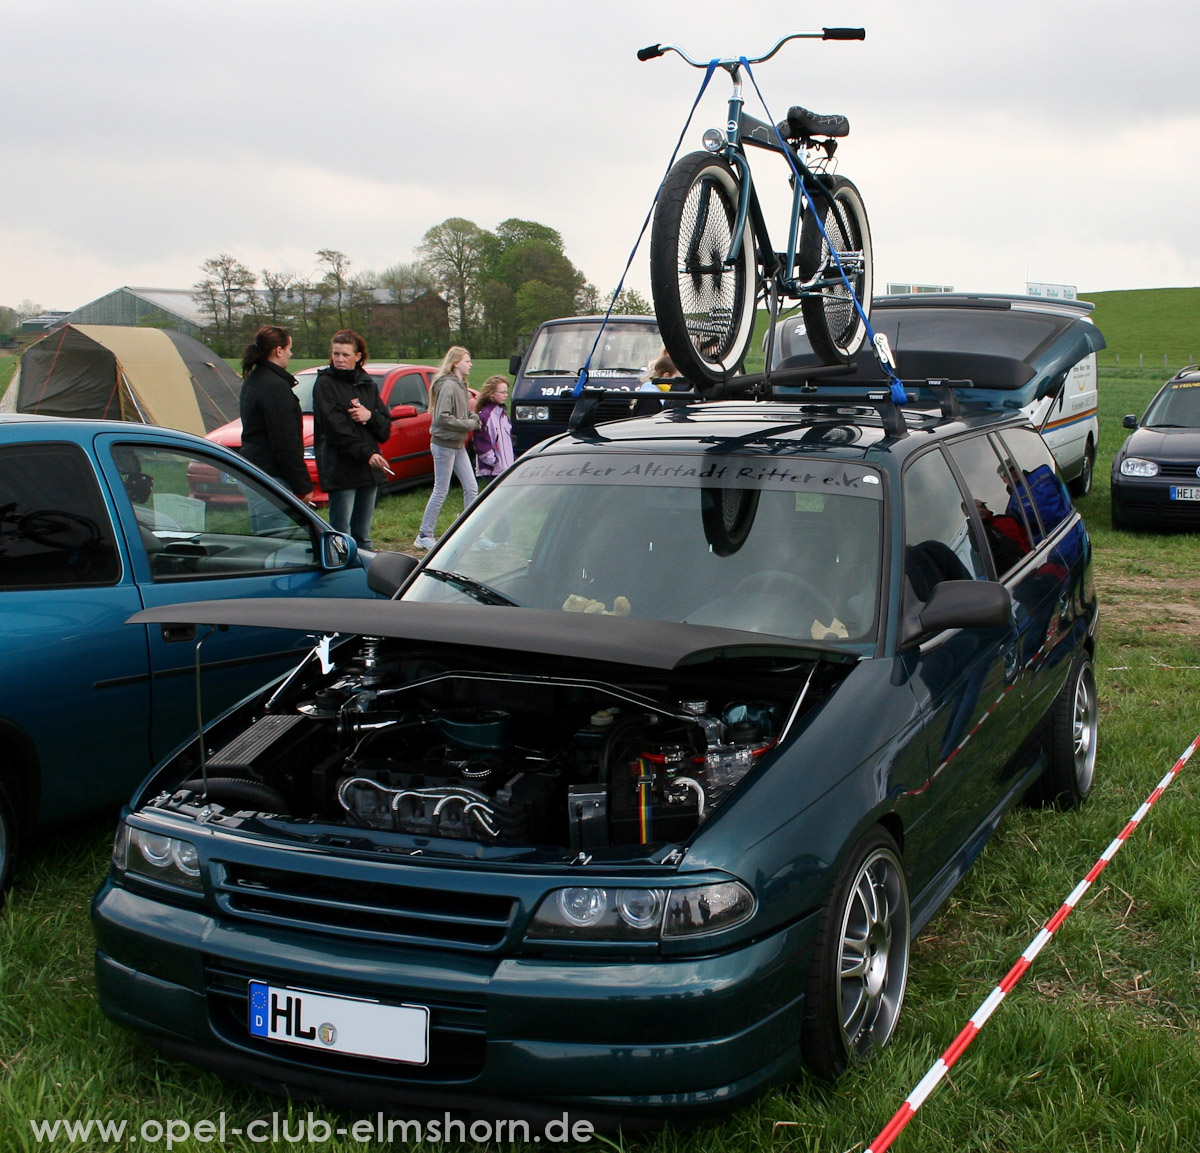 Brunsbuettel-2010-0032-Astra-F-Caravan